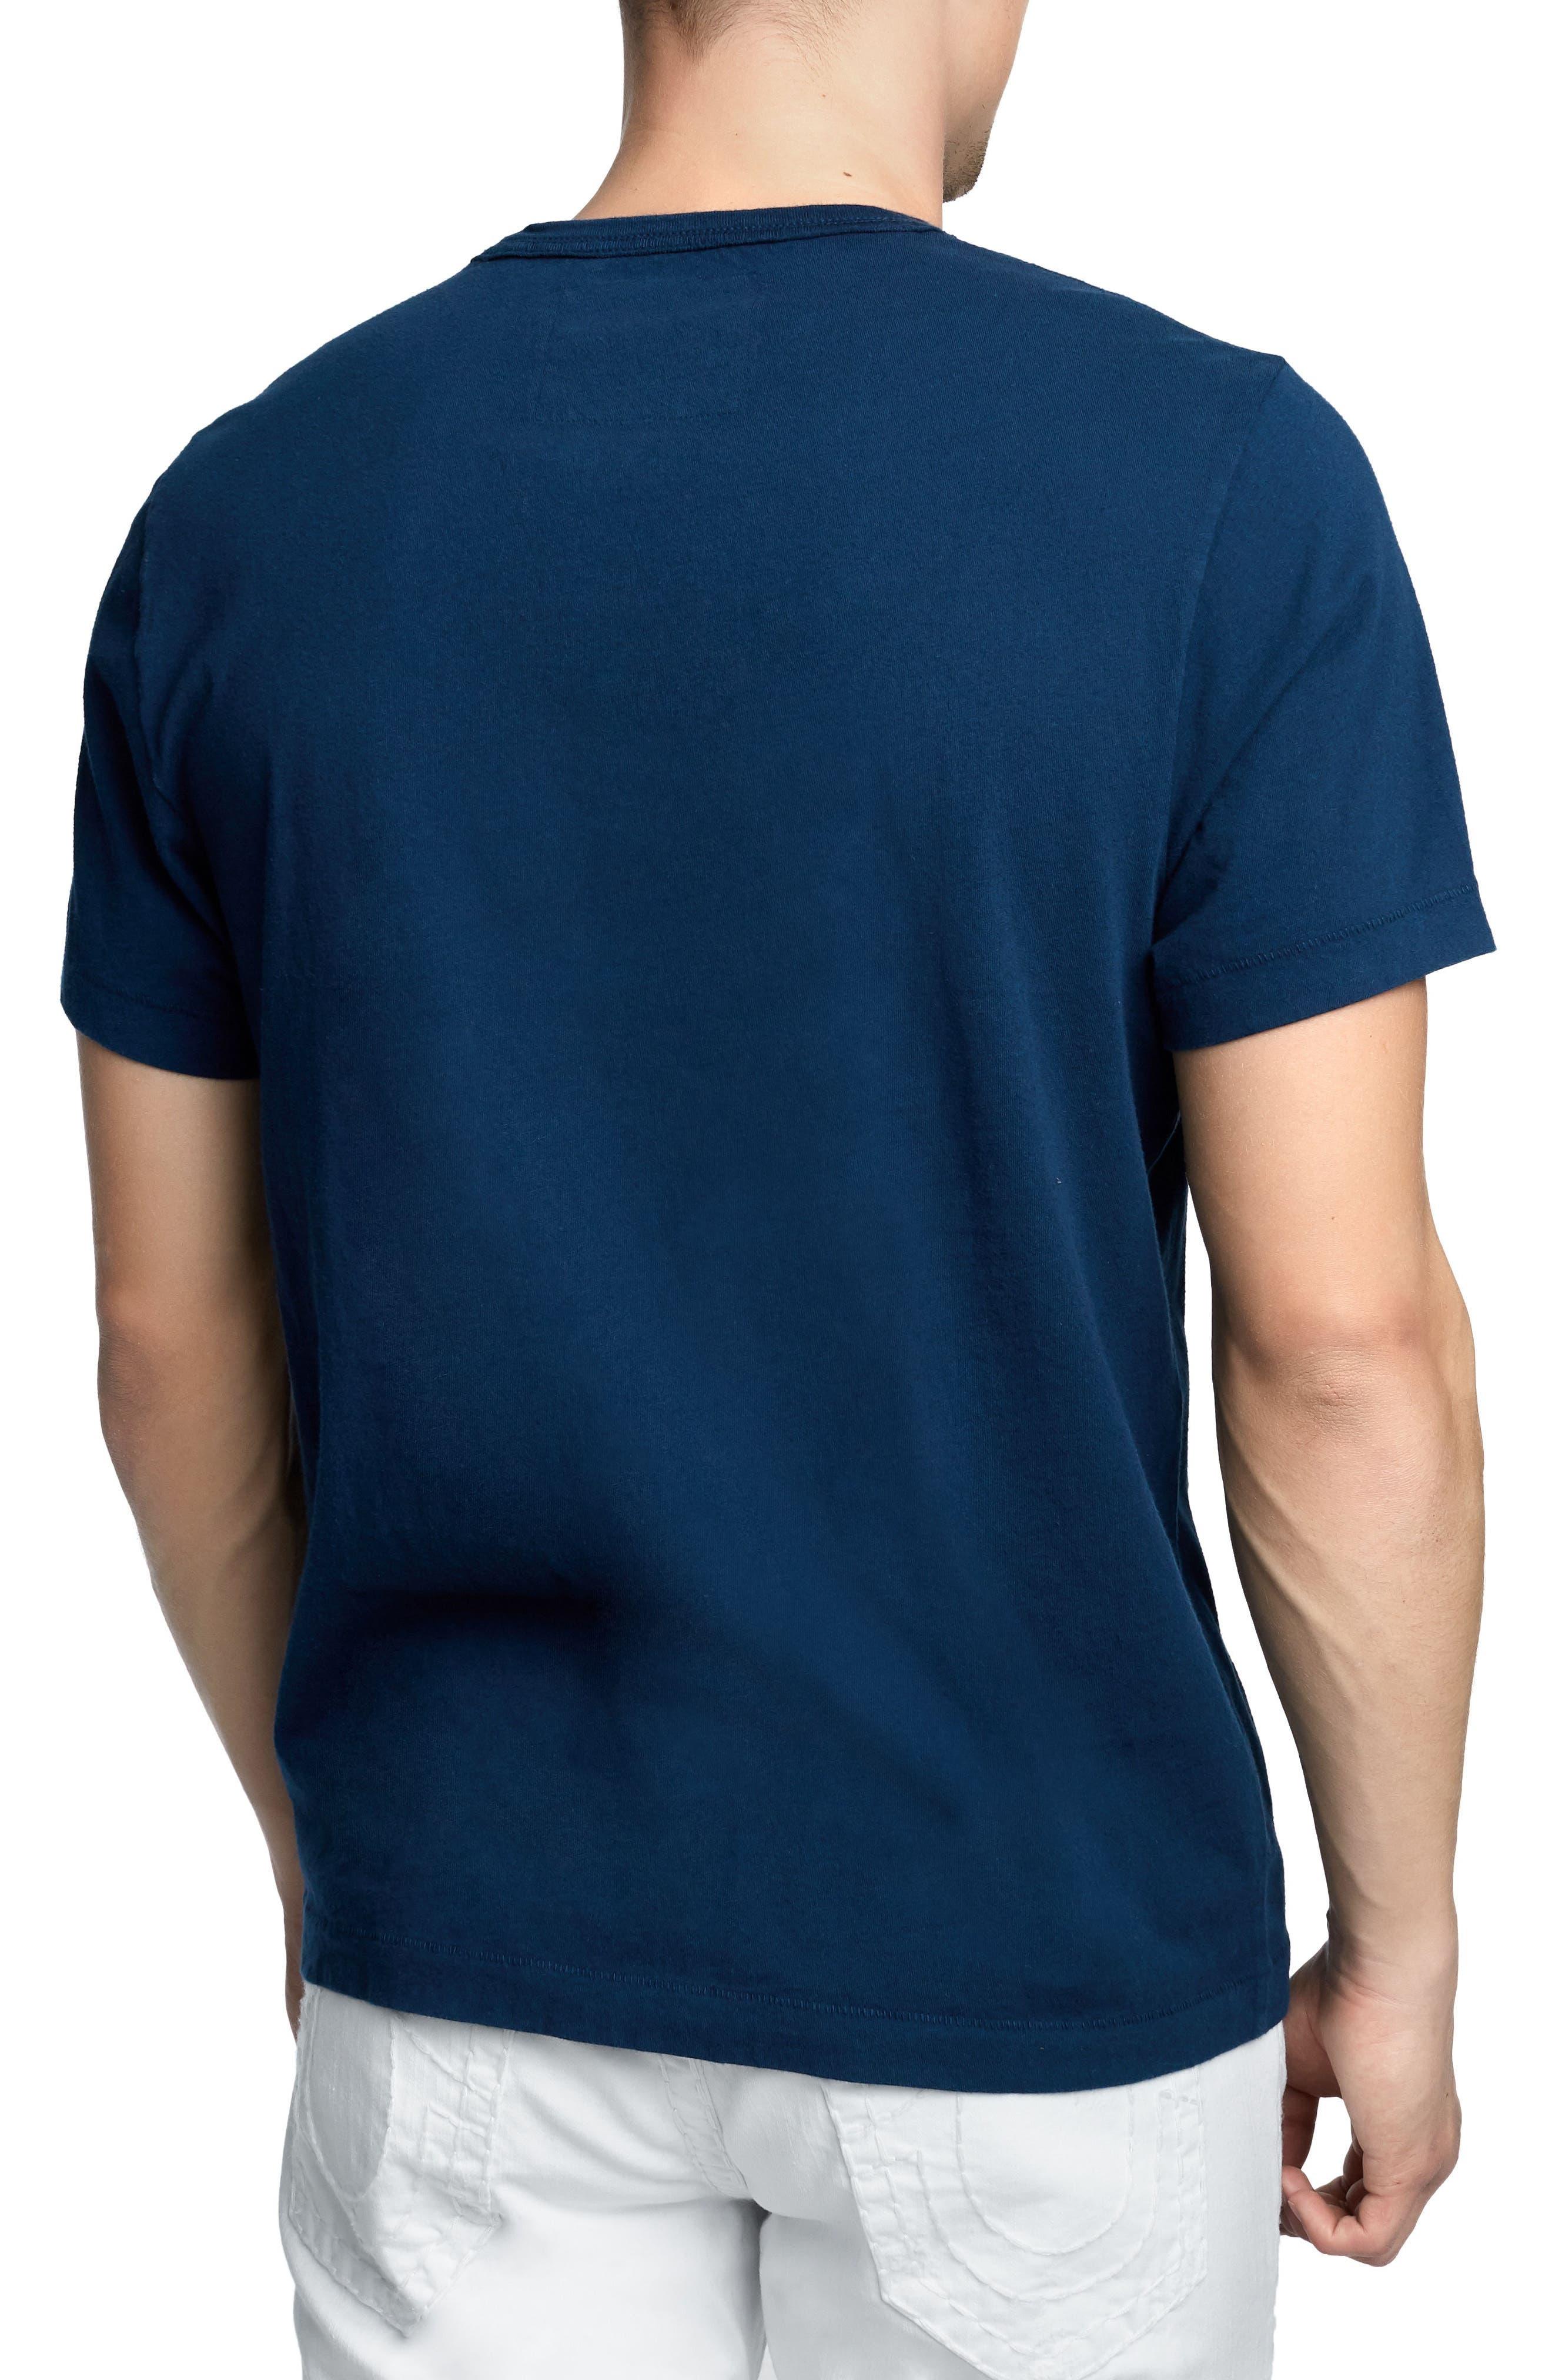 True Slogan T-Shirt,                             Alternate thumbnail 2, color,                             Ace Blue